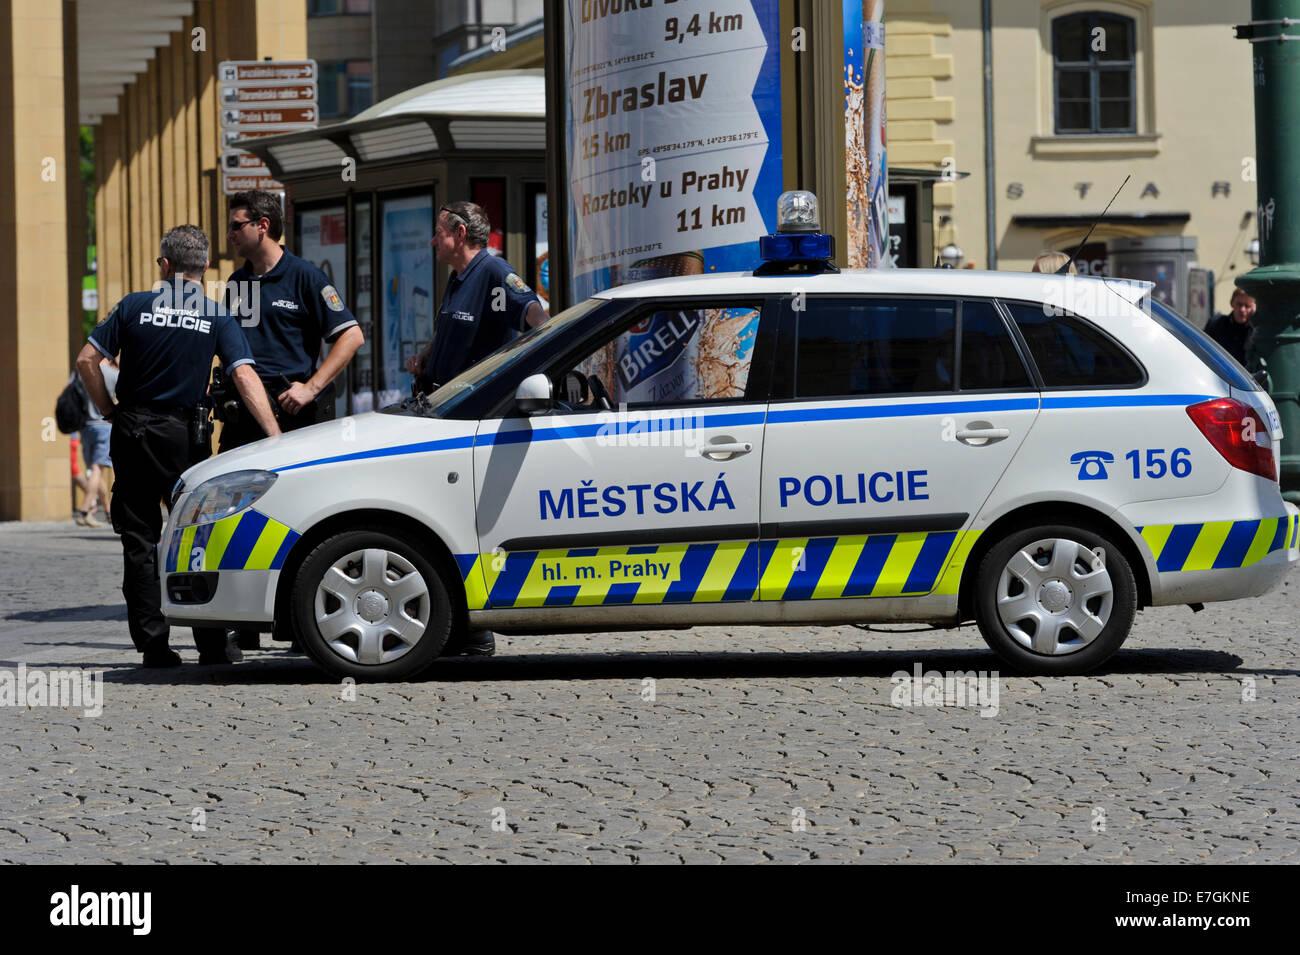 Auto Sale Czech Republic: A Modern Police Car In Prague, Czech Republic Stock Photo